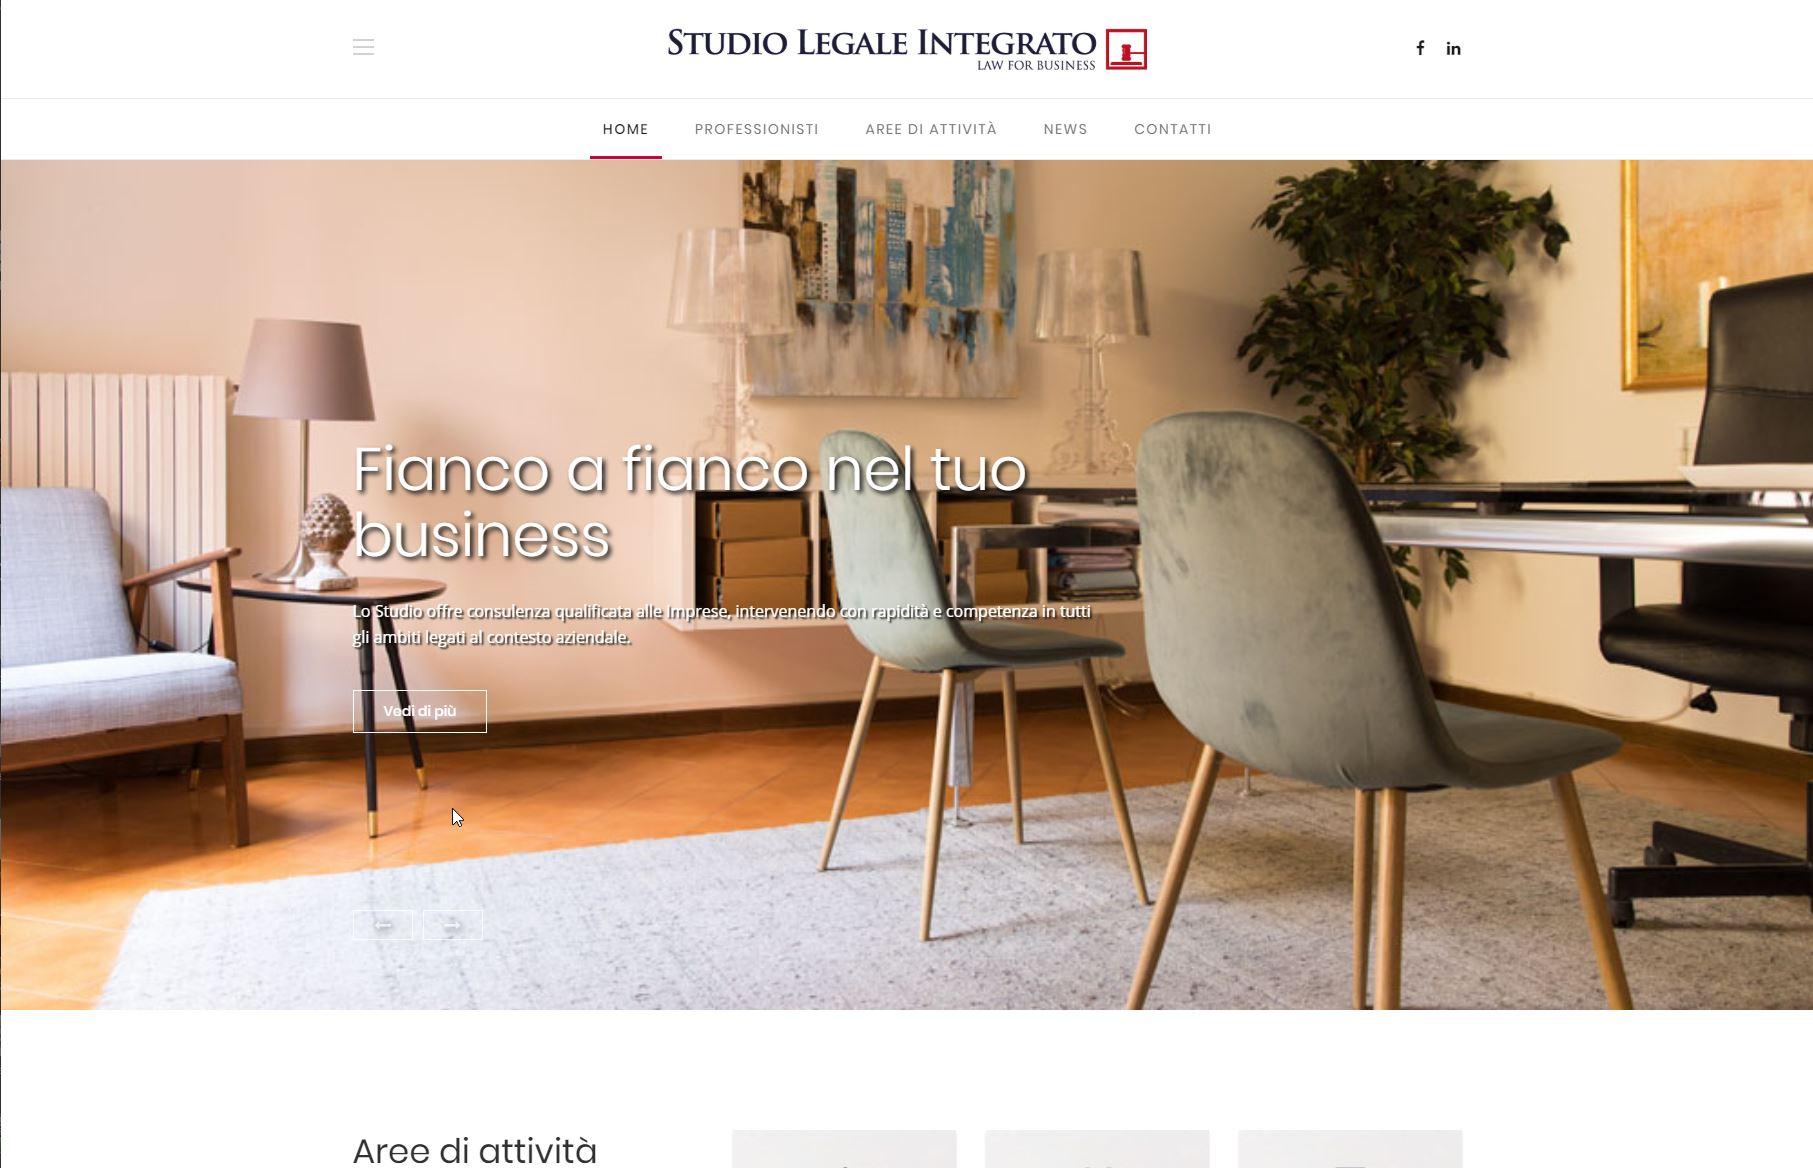 www.studiolegaleintegrato.com